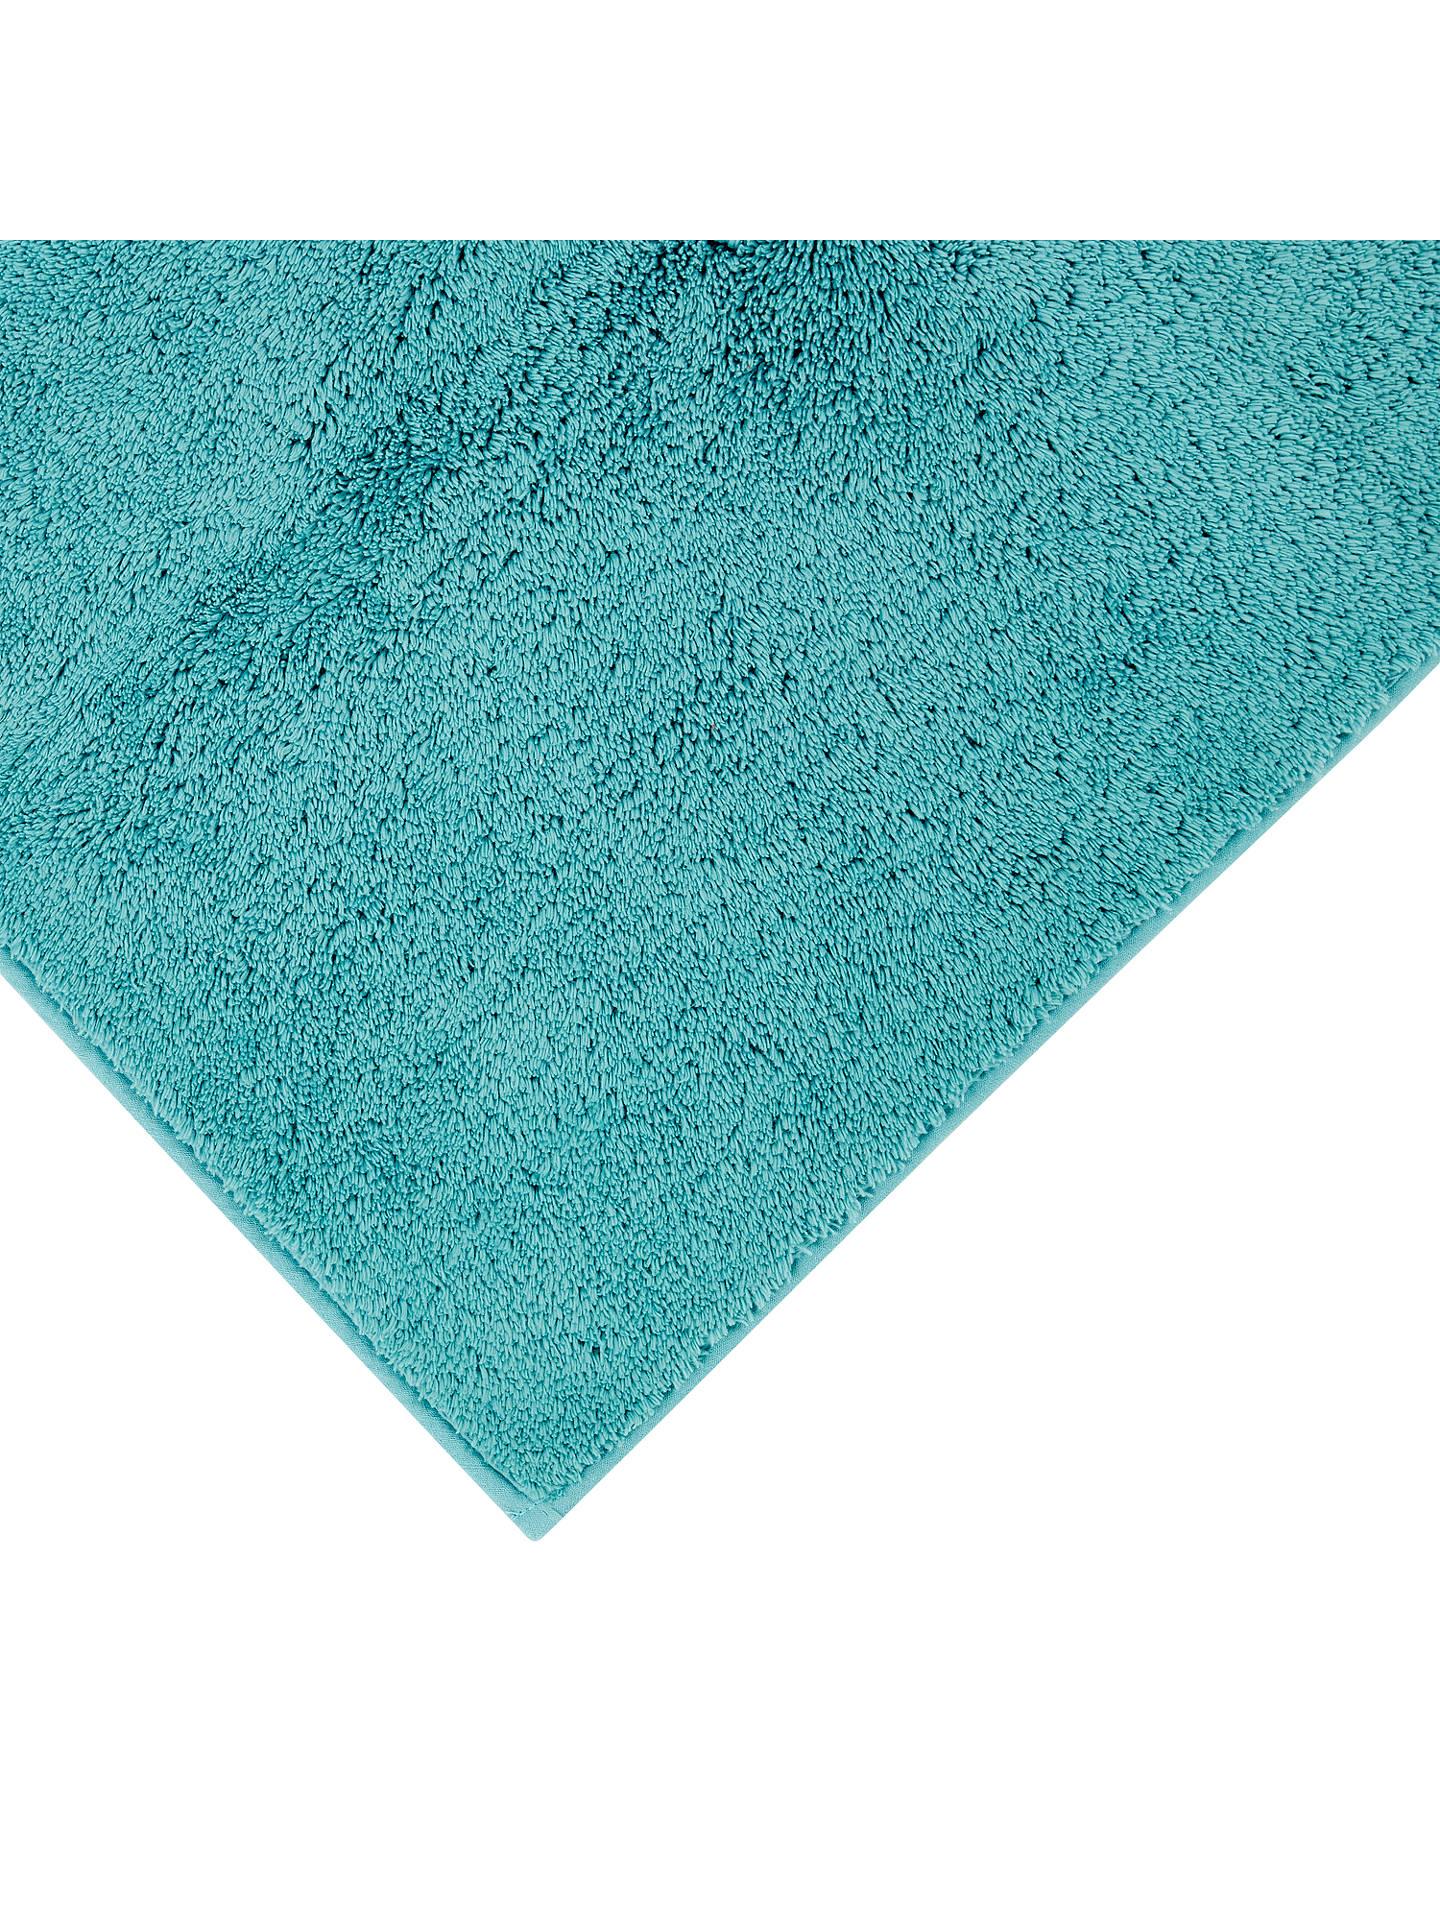 John Lewis Amp Partners Ultra Soft Non Slip Cotton Bath Mat